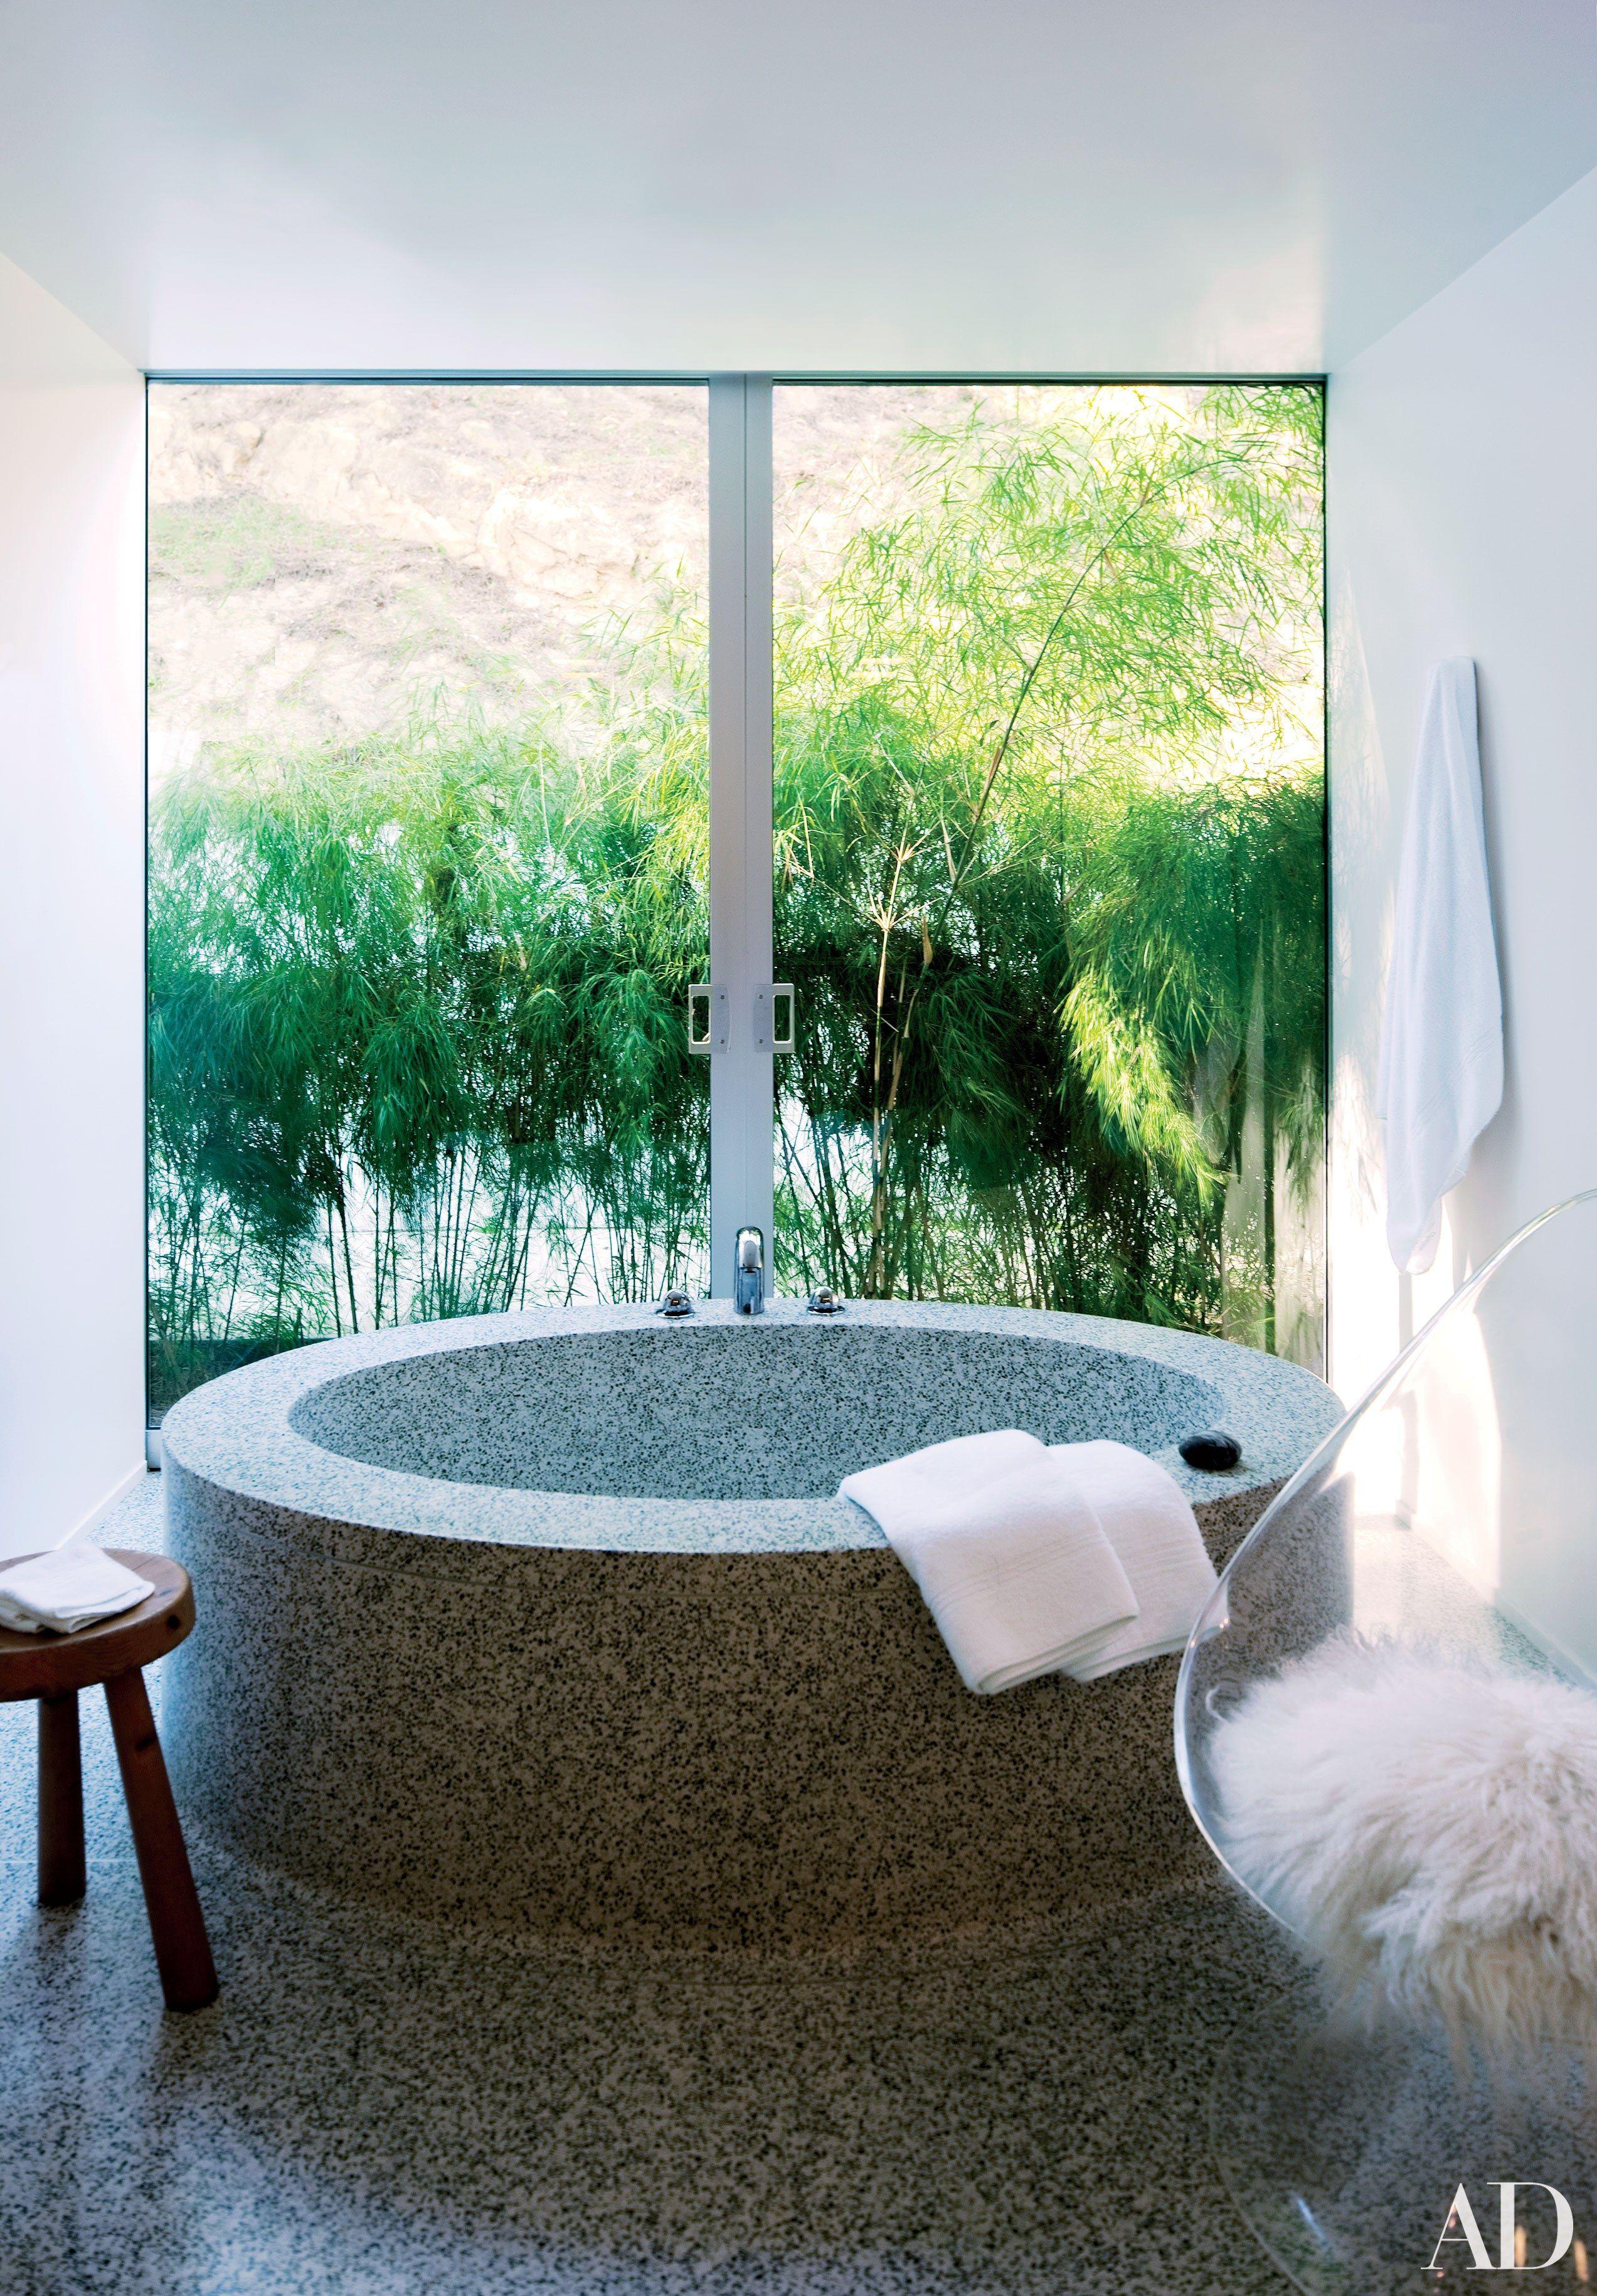 22 Luxury Bathrooms in Celebrity Homes | Architectural digest, Bath ...